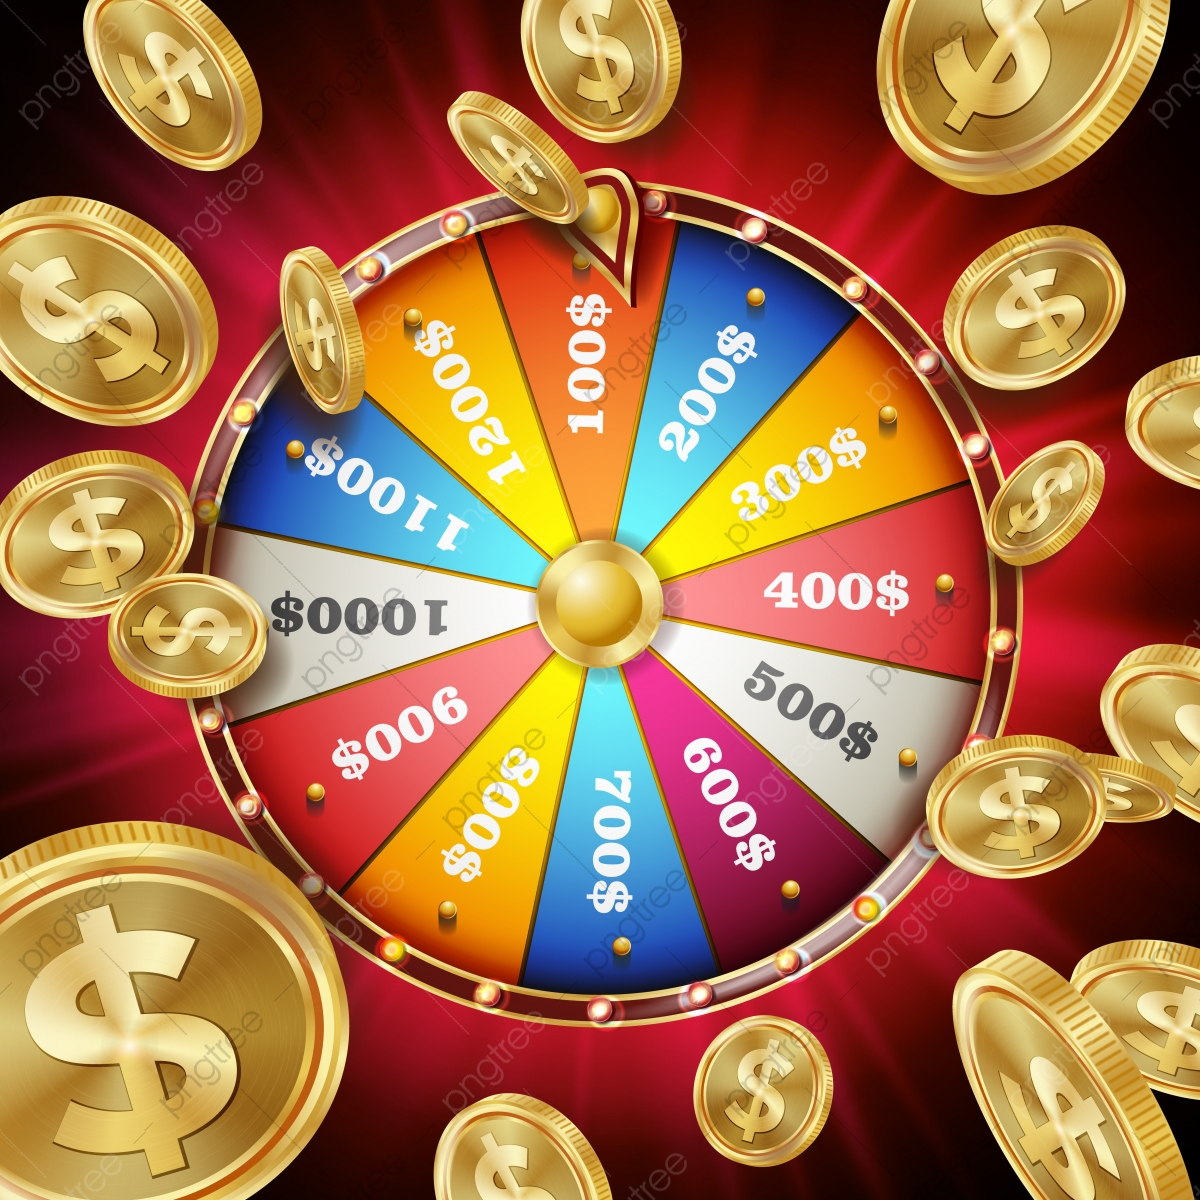 wheel of fortune borrow